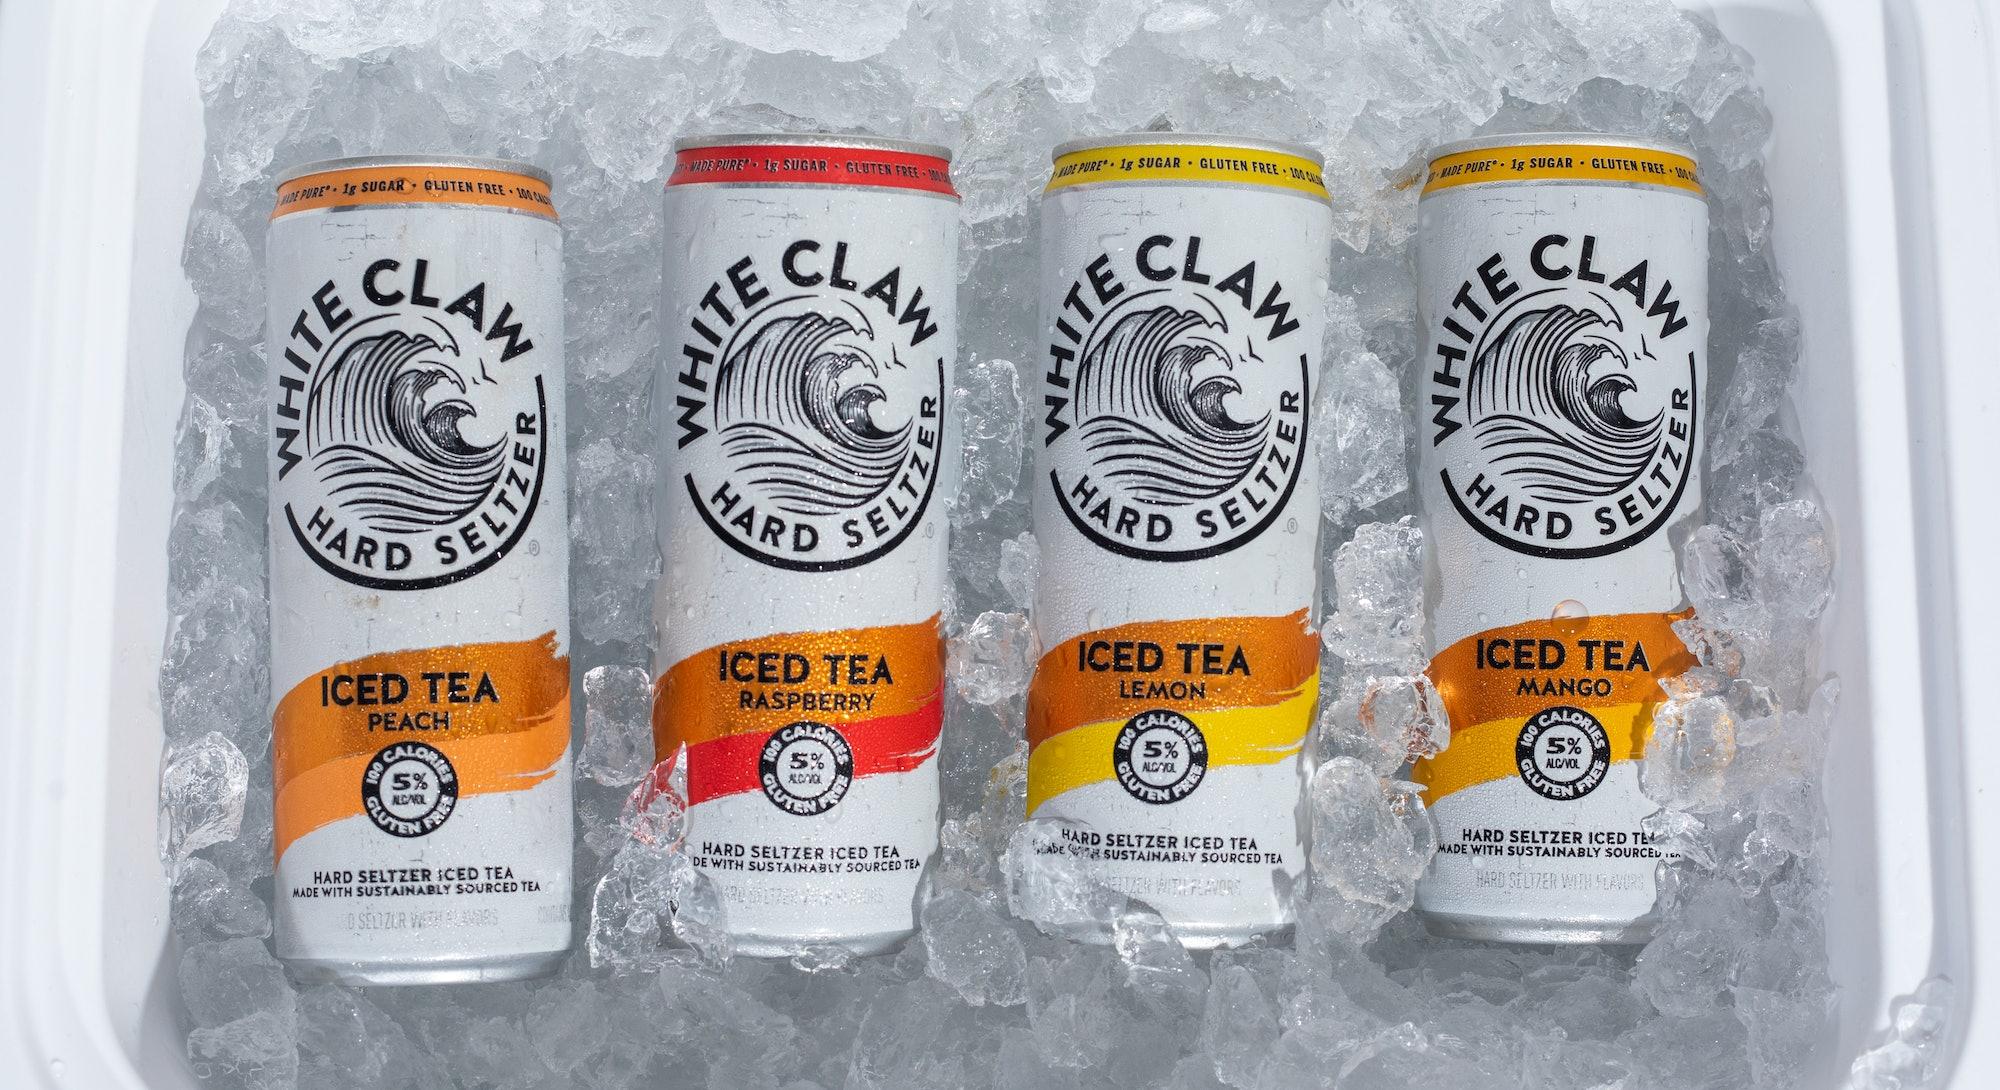 How do White Claw Iced Tea and Truly Iced Tea compare?